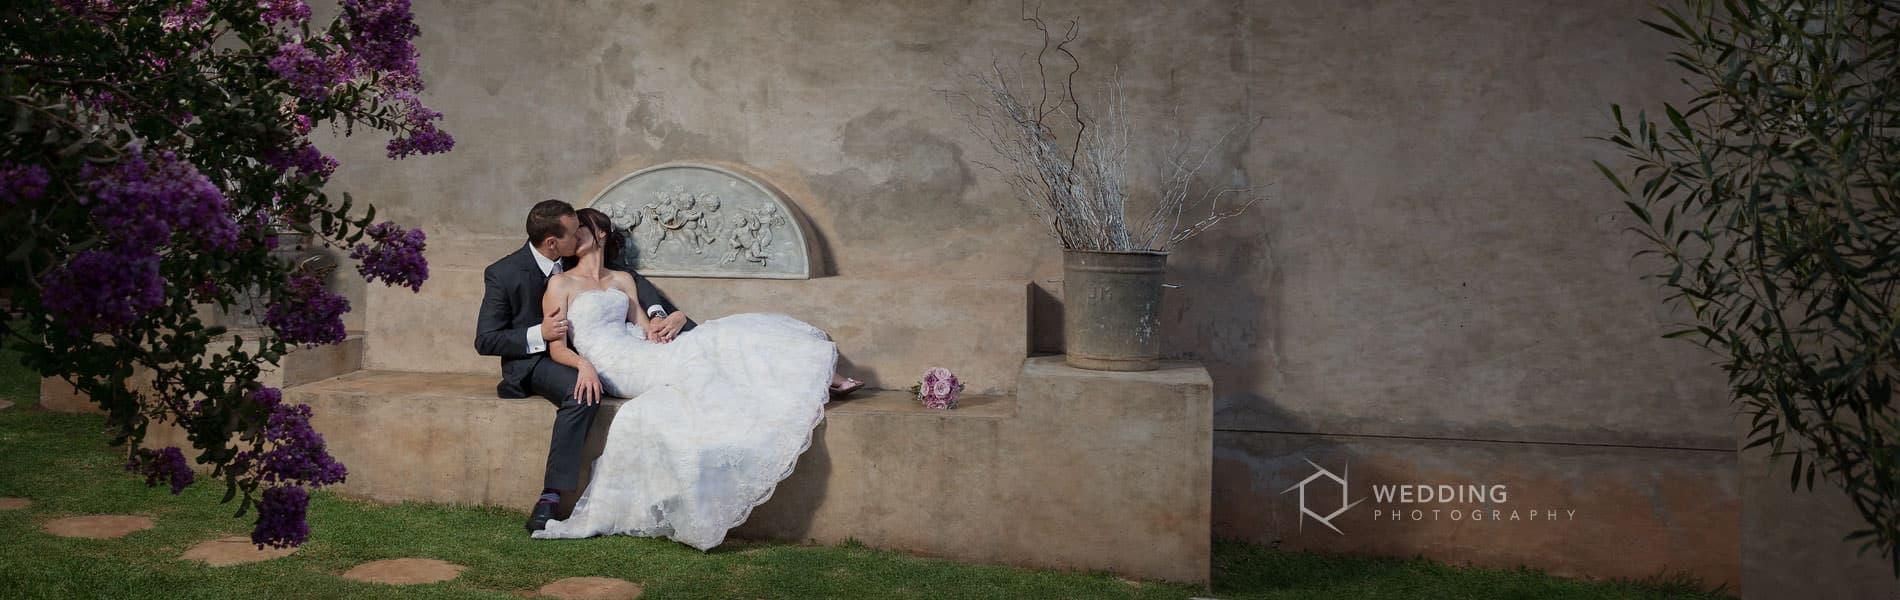 Wedding photographer in Johannesburg, Sandton and Pretoria